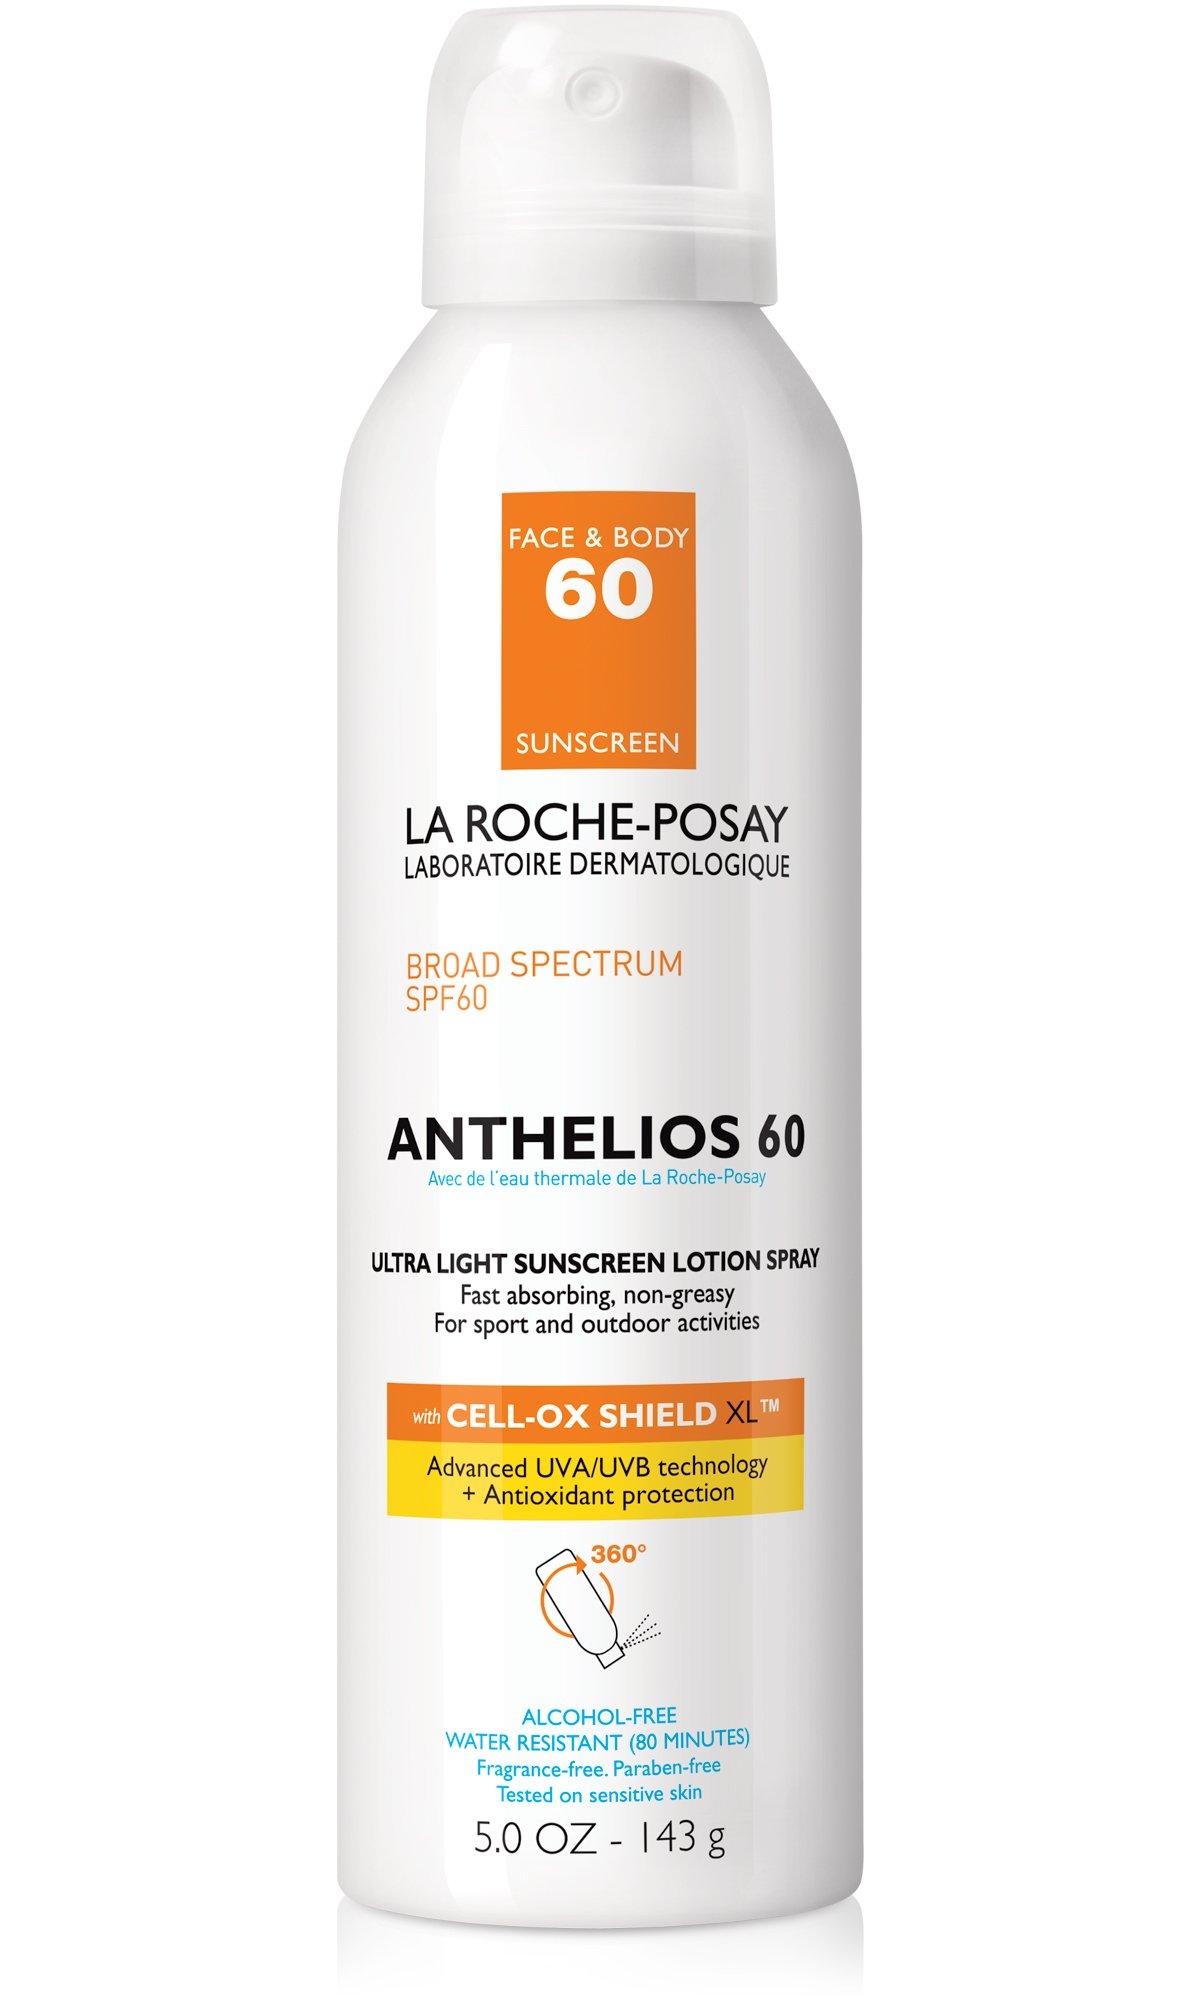 La Roche-Posay Anthelios Ultra-Light Sunscreen Spray Lotion SPF 60, 5 Fl. Oz. by La Roche-Posay